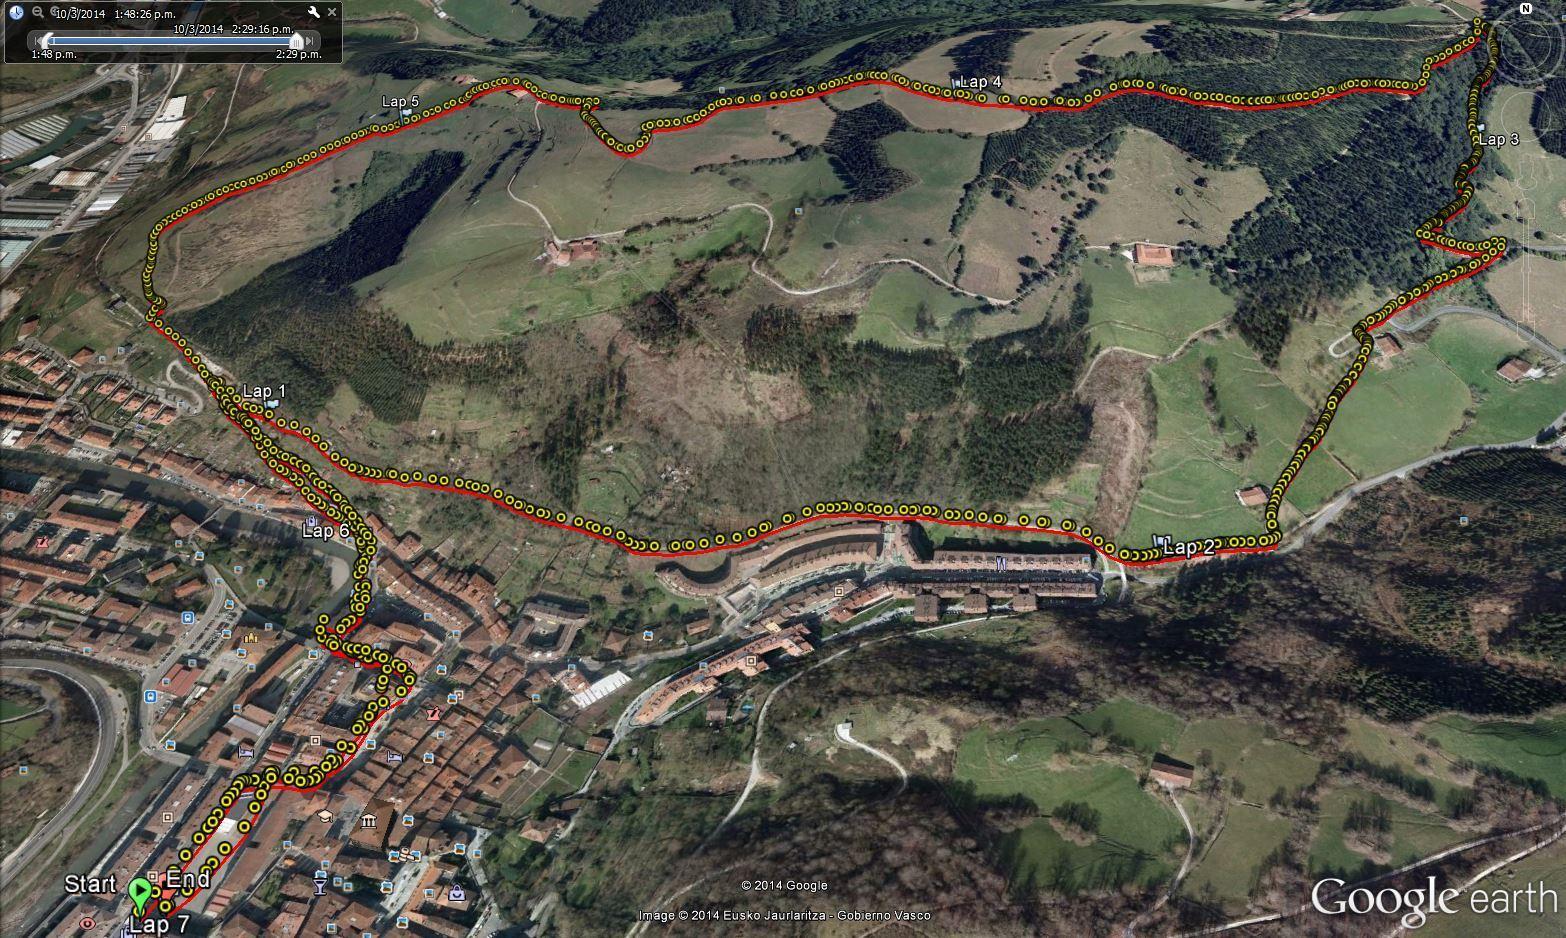 SAN SILBESTRE TRAIL BERGARA - IBILBIDEA - RECORRIDO